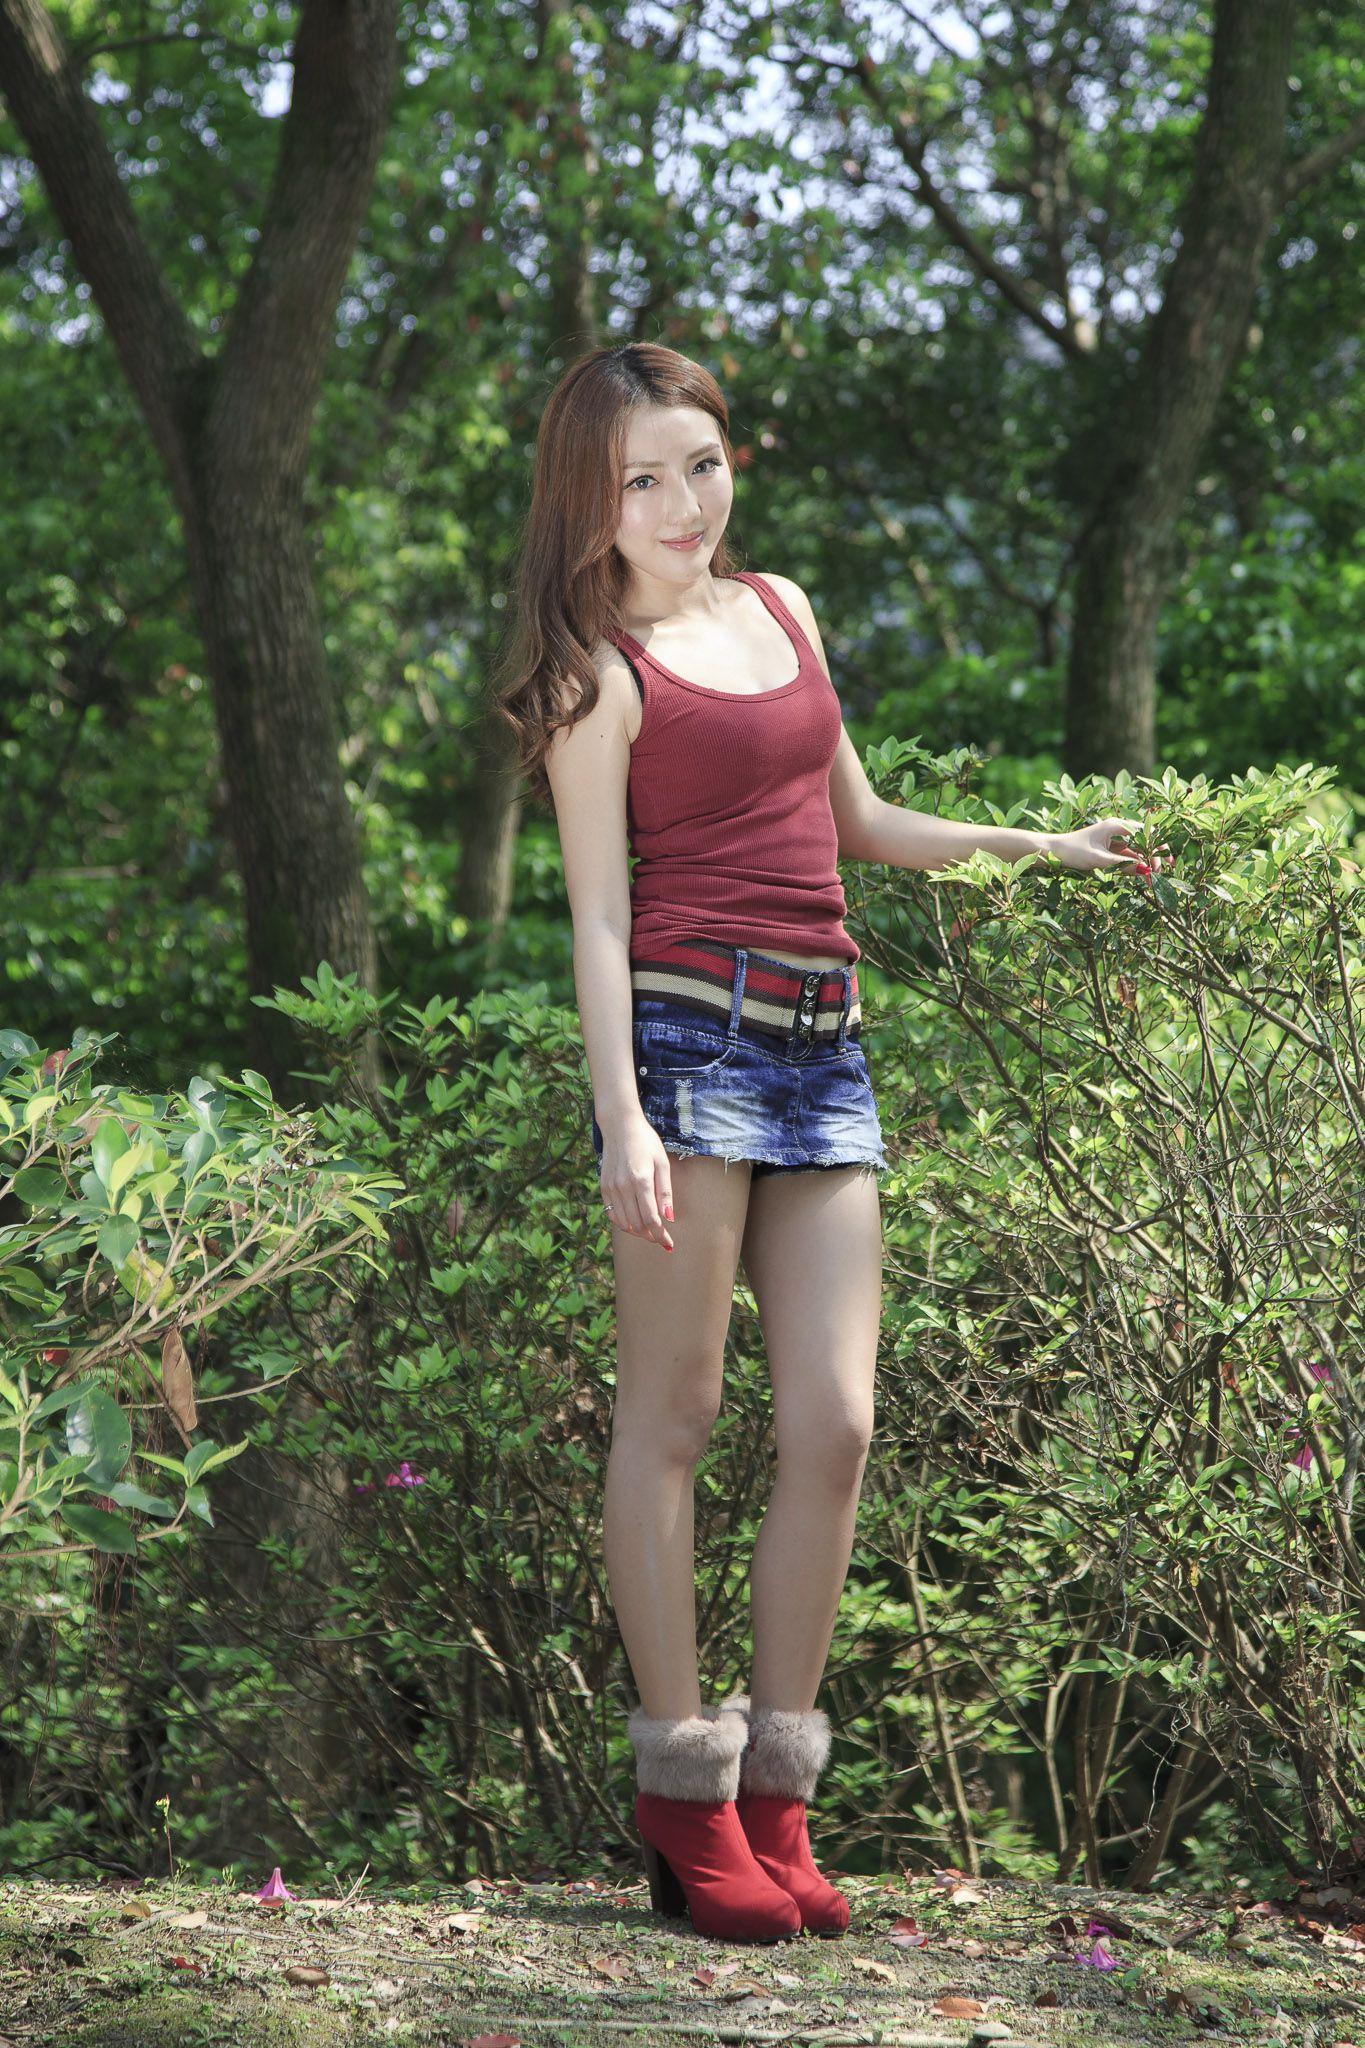 VOL.755 [台湾正妹]气质清新唯美养眼明星:赵芸(腿模Syuan,Syuan赵芸)高品质写真套图(33P)